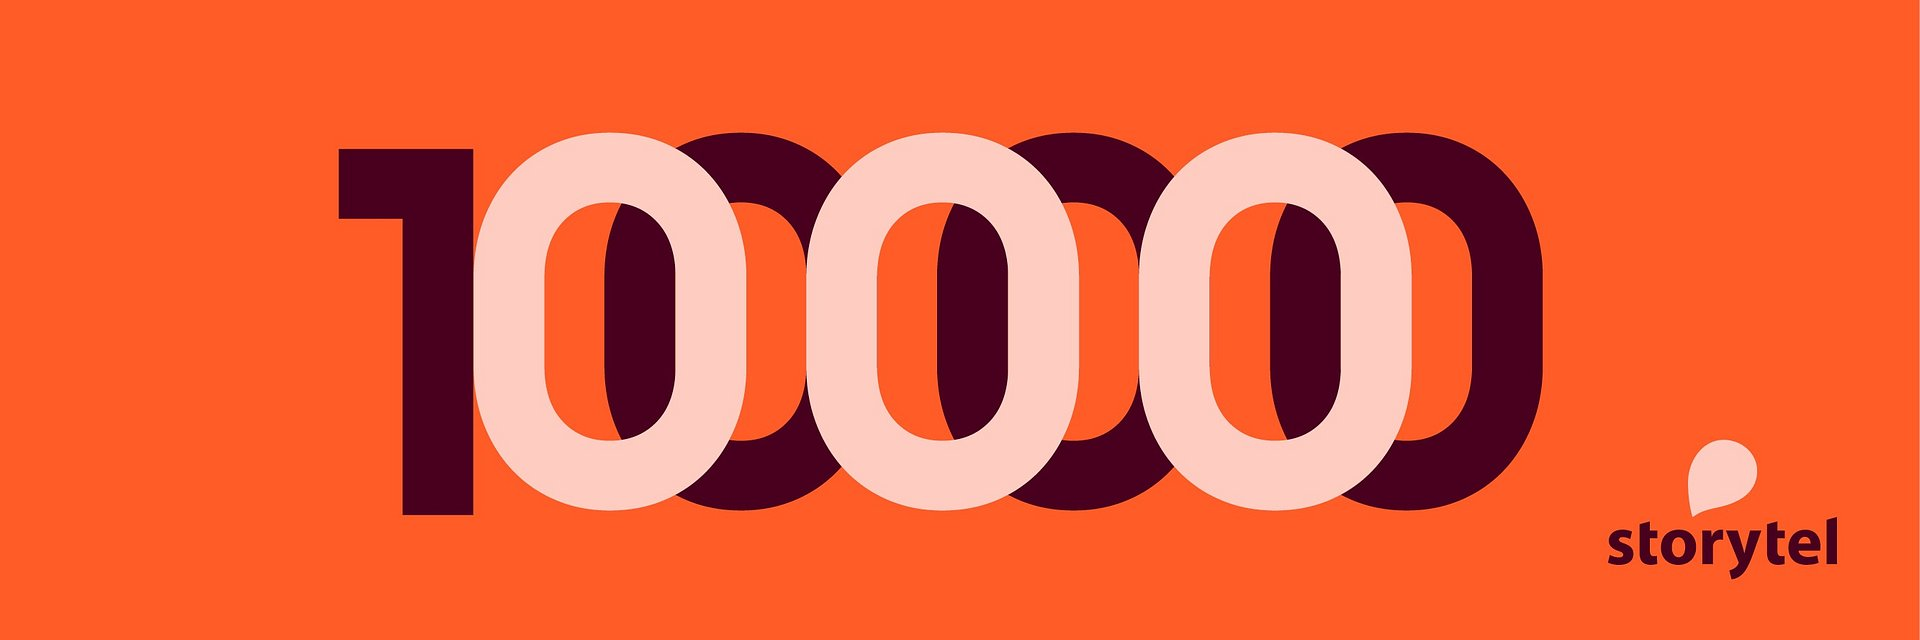 Storytel ma już ponad milion abonentów